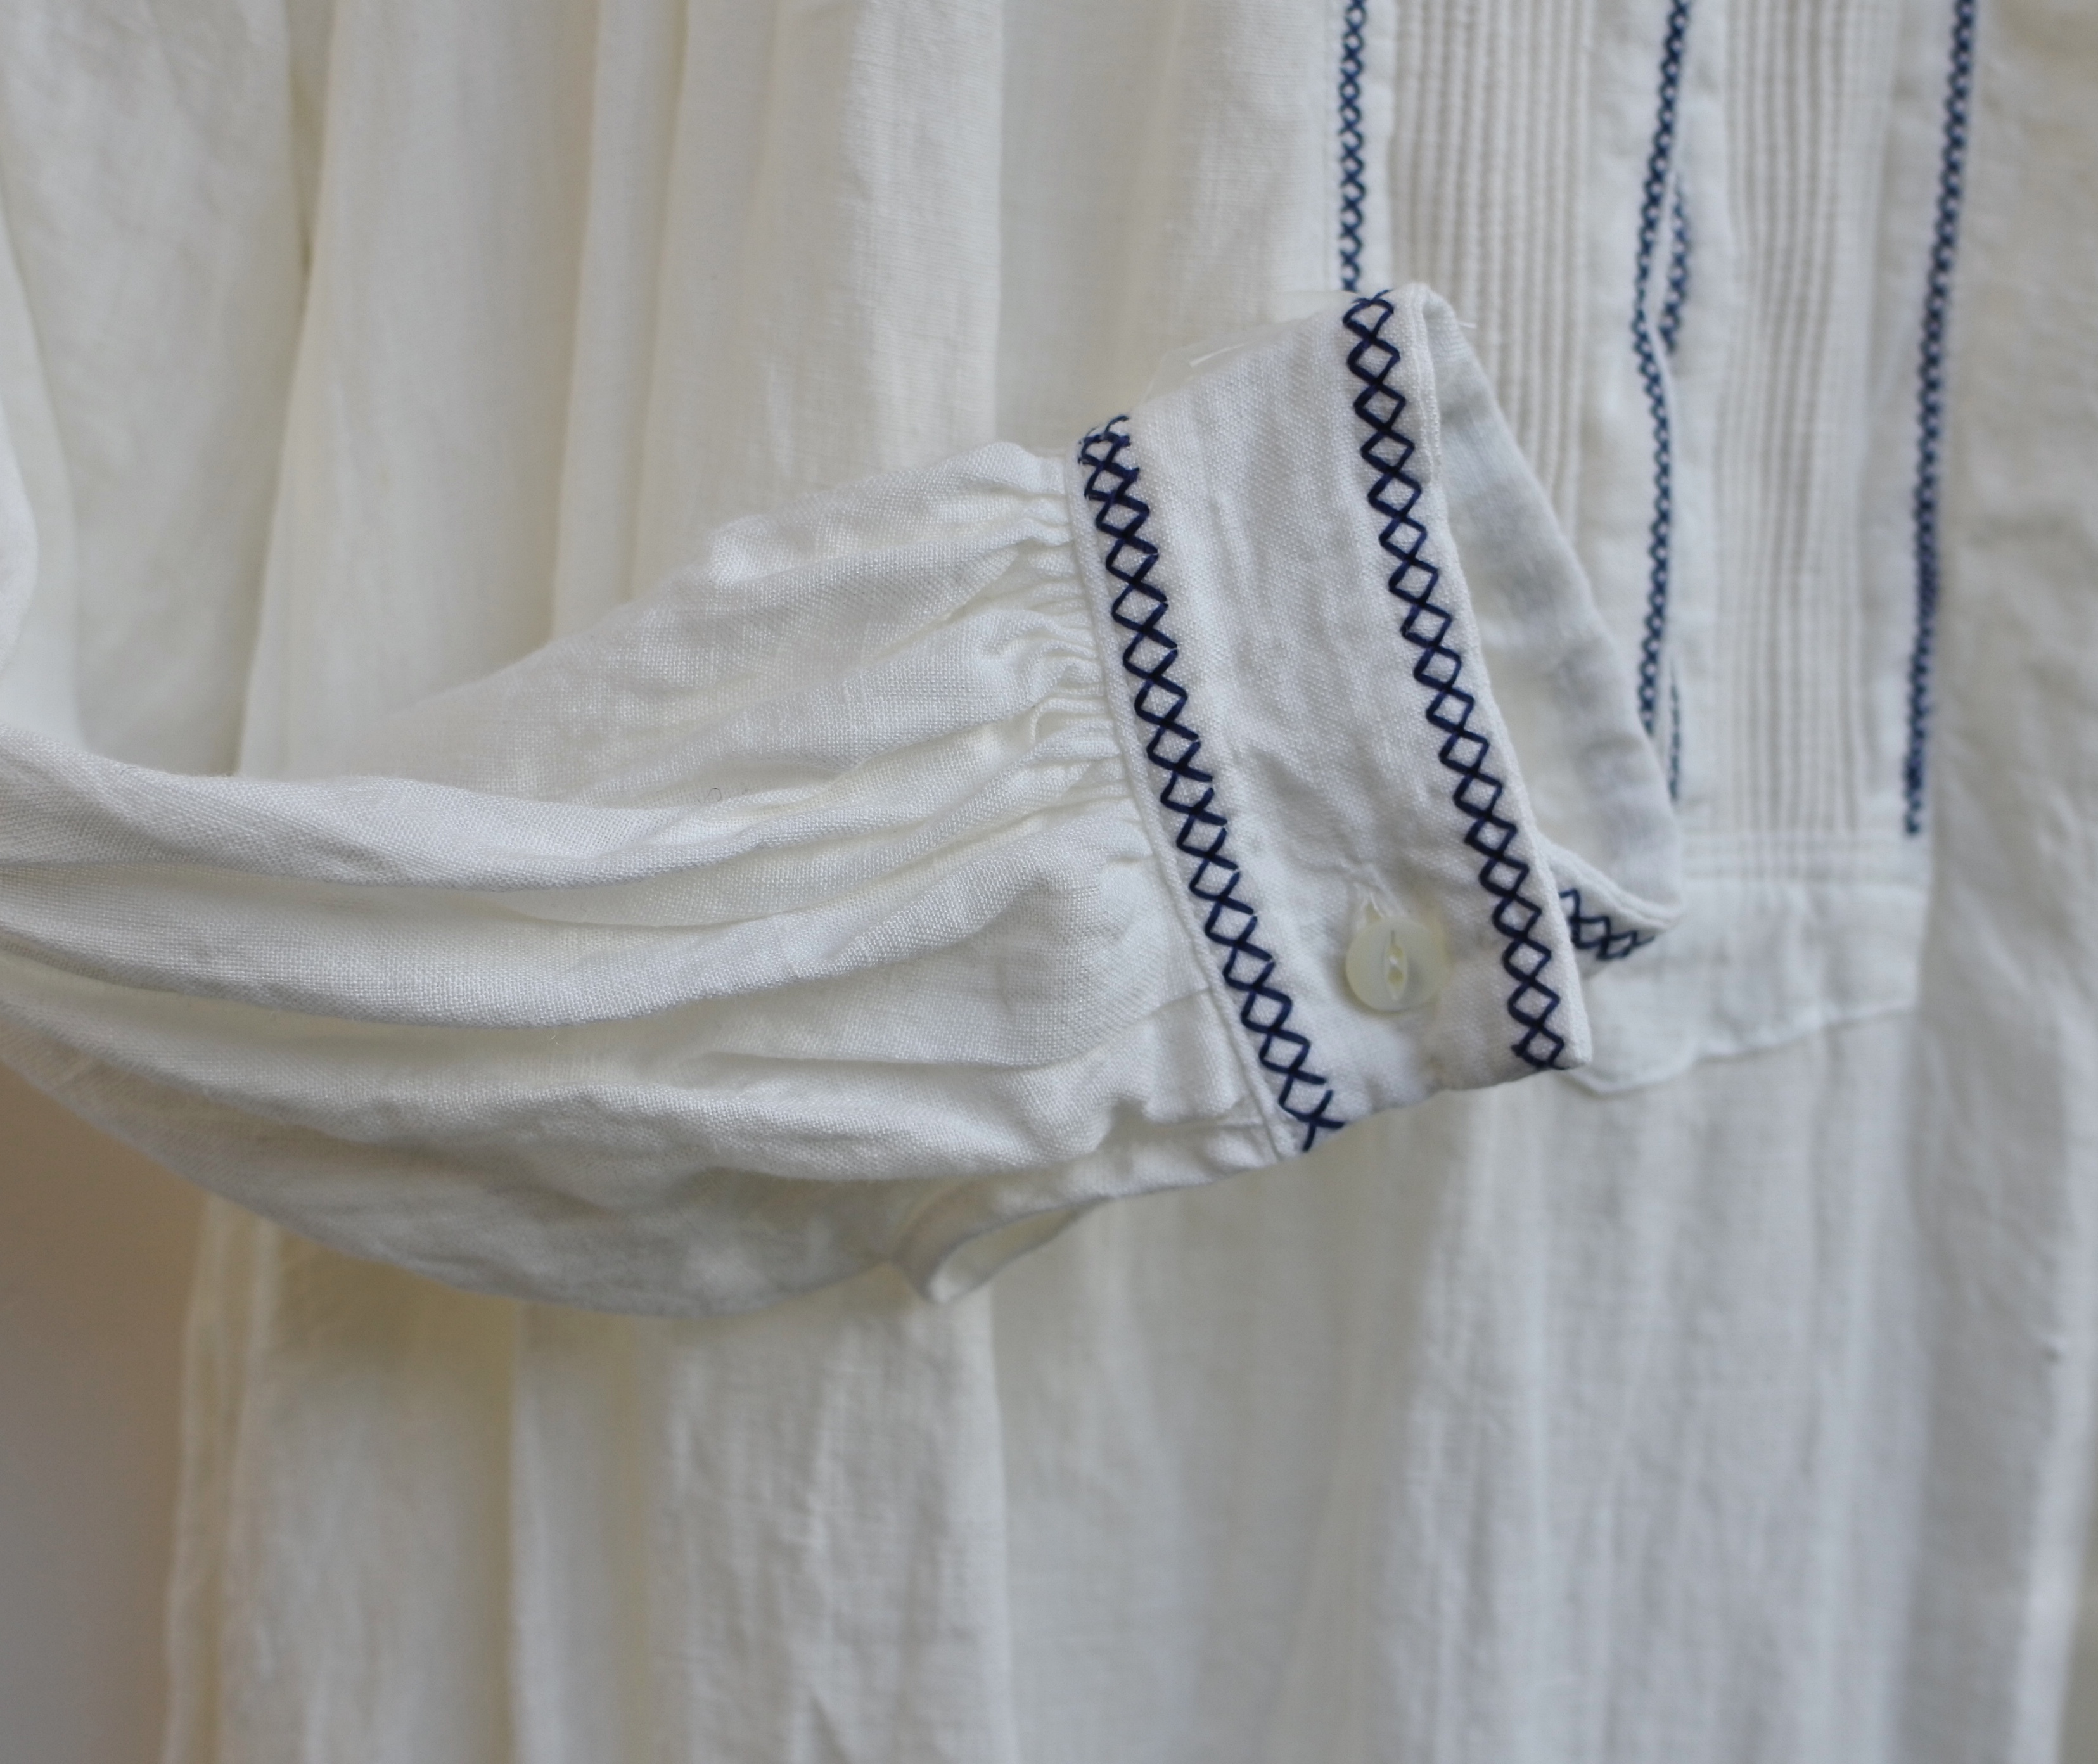 hallelujha /羊飼いののローブ1800年代